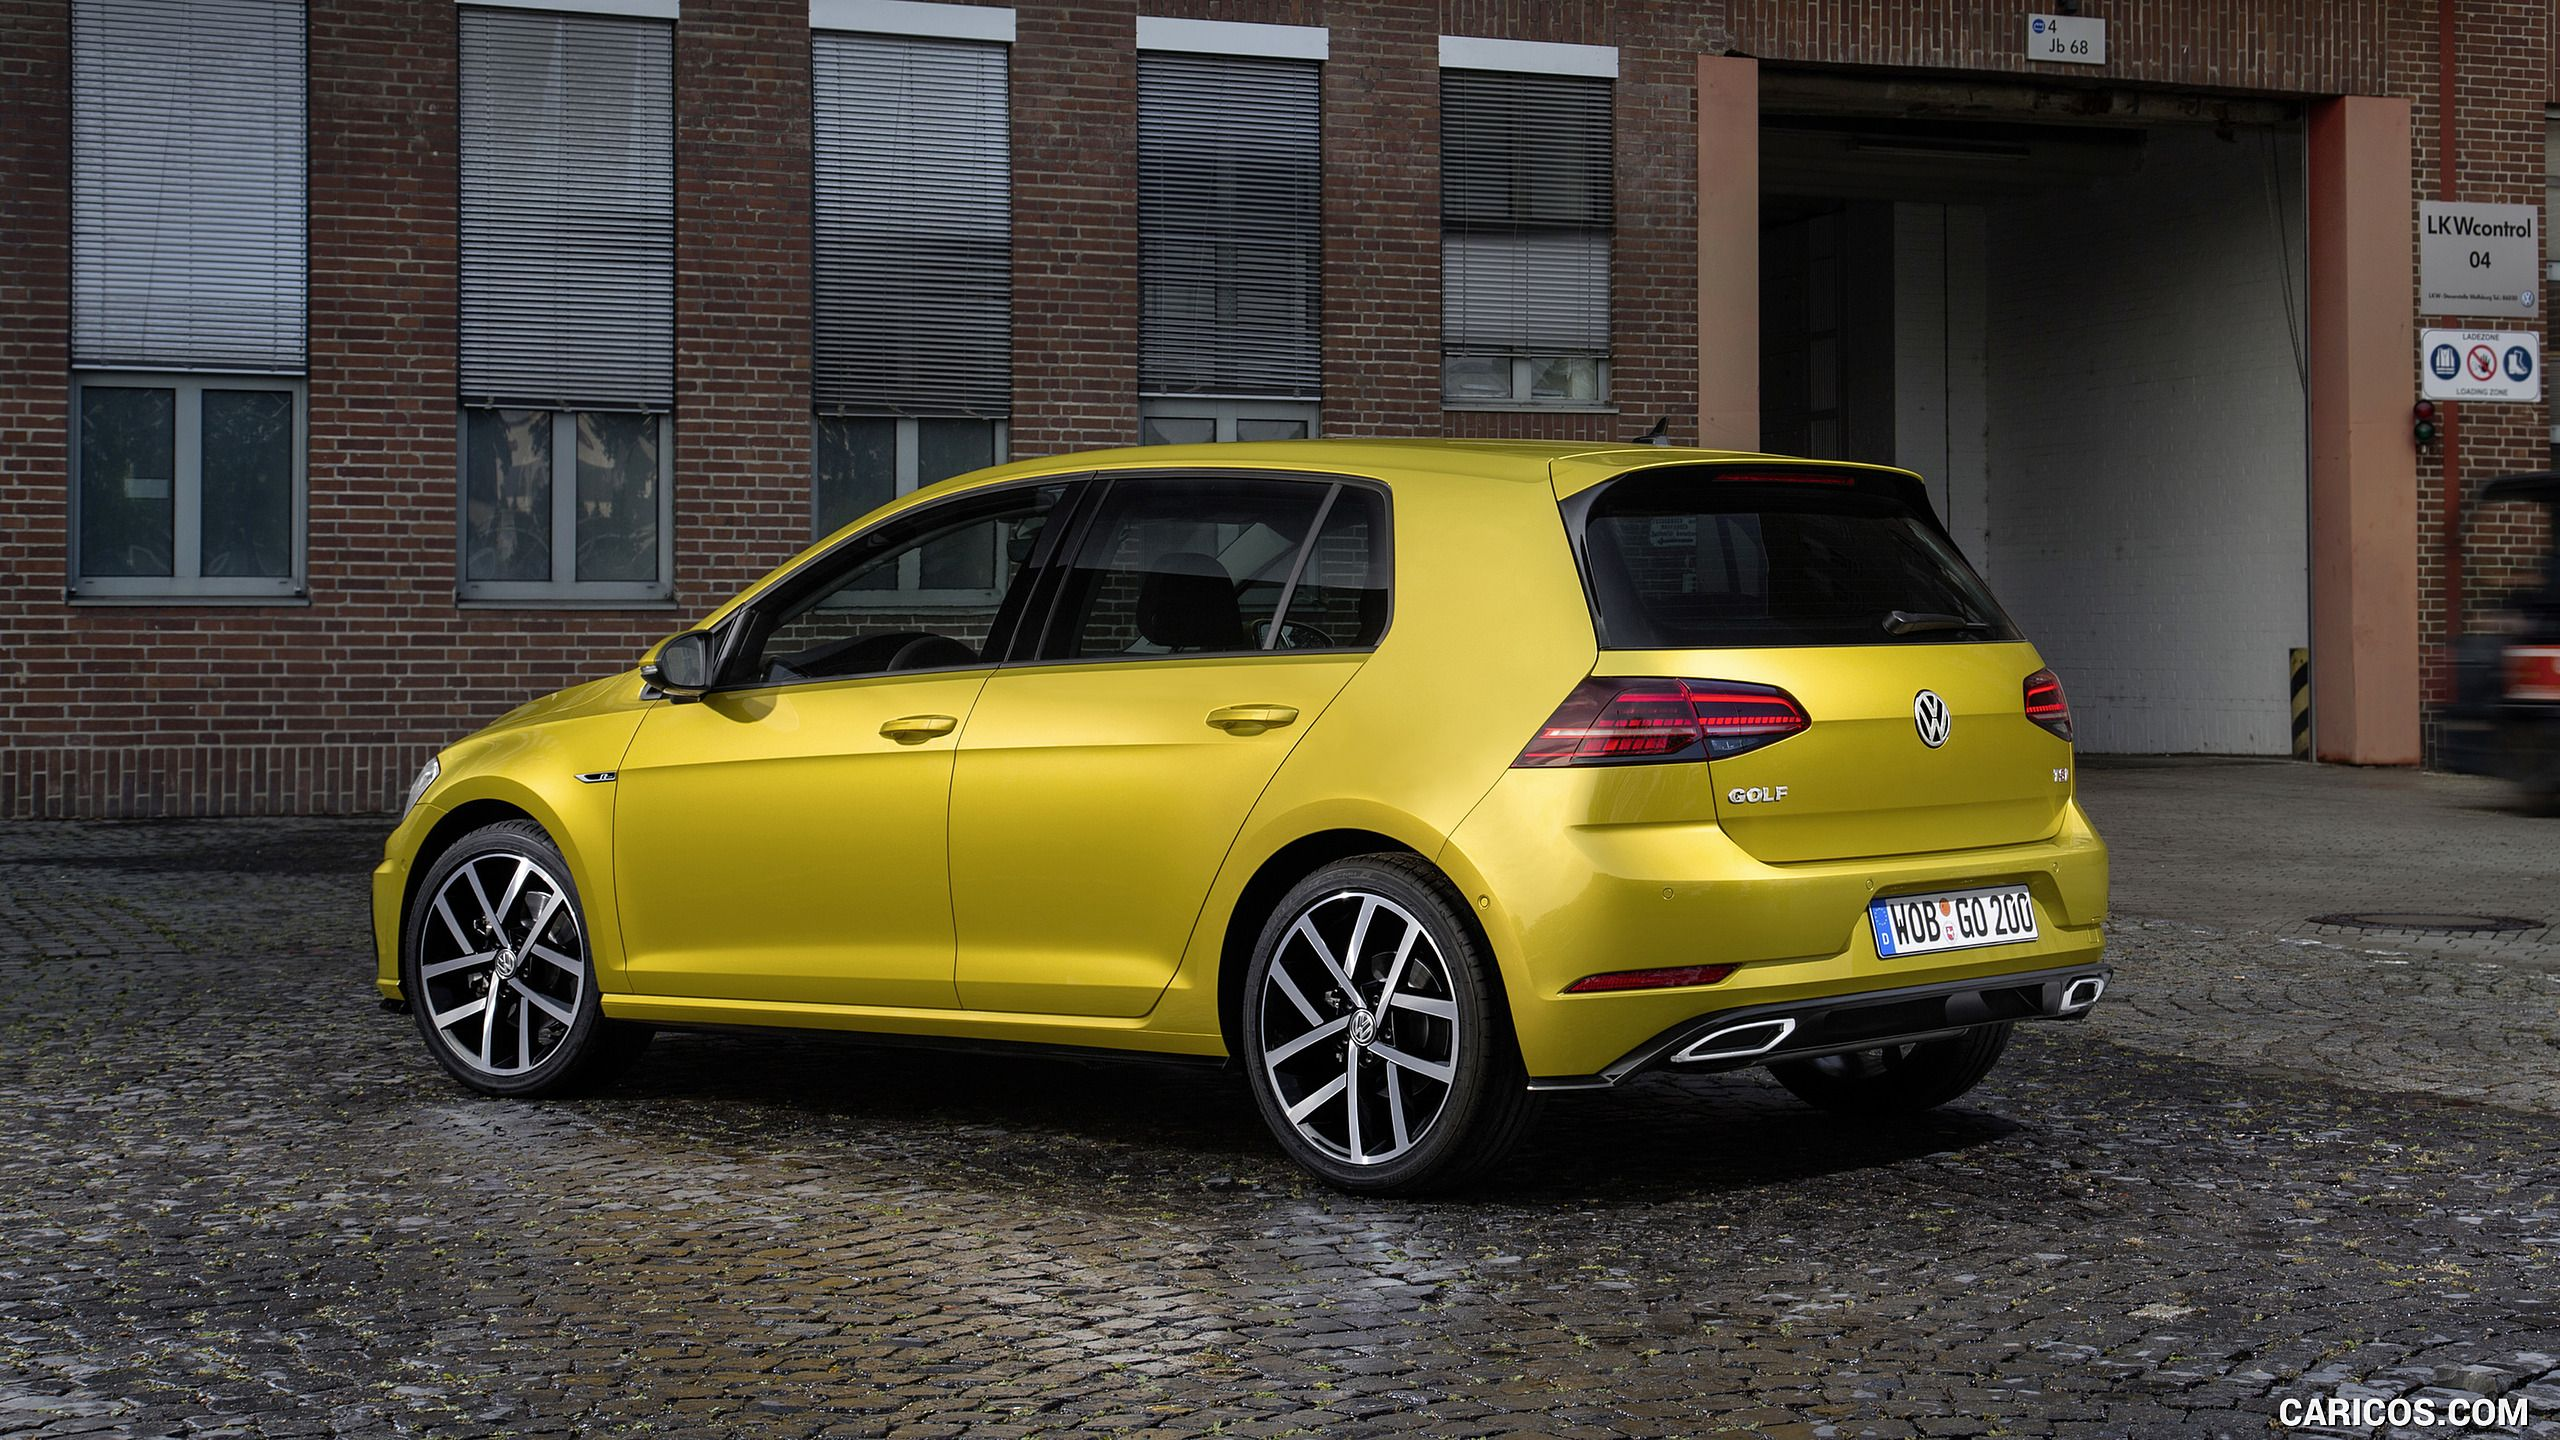 2017 volkswagen golf 7 facelift wallpaper   germany cars   pinterest